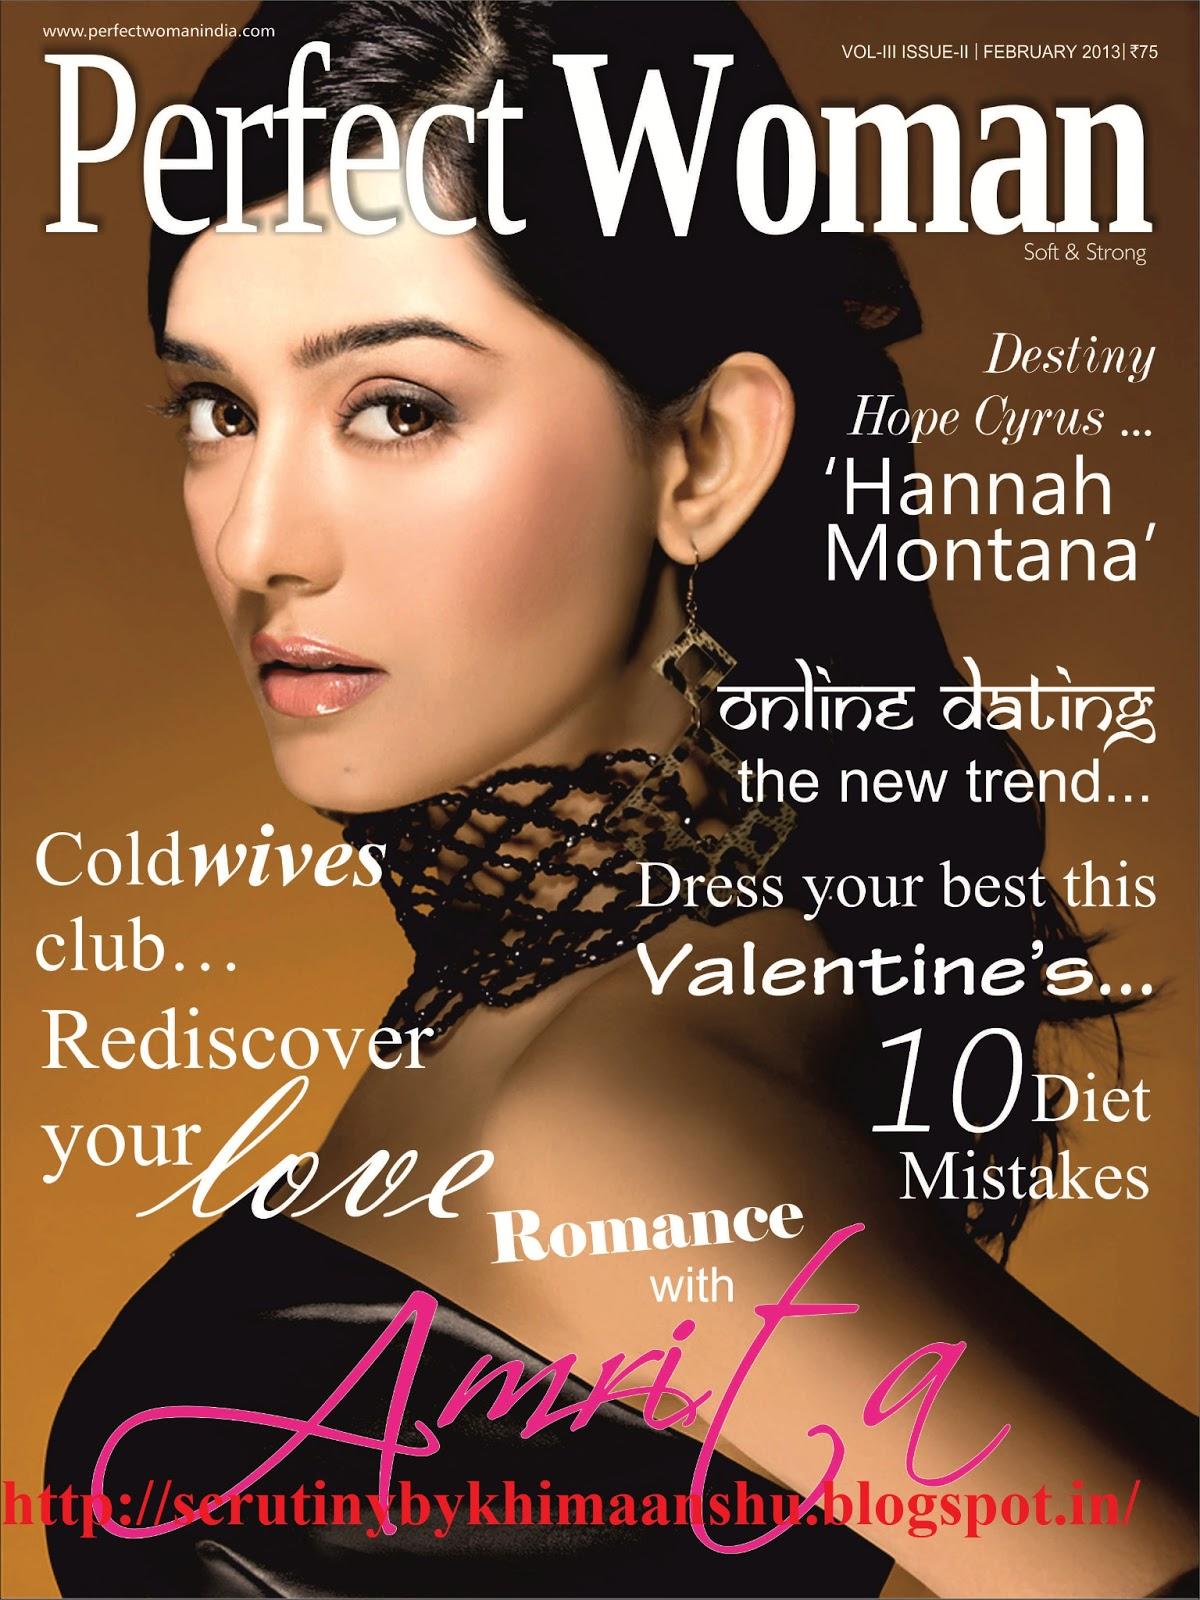 http://1.bp.blogspot.com/-A_s_8_nigVc/UQe9Om6pqgI/AAAAAAAAJK4/0Z6BOJIWnH0/s1600/Amrita_Rao_Perfect+Woman+Magazine_Cover_February-2013_K+Himaanshu+Shukla.jpg